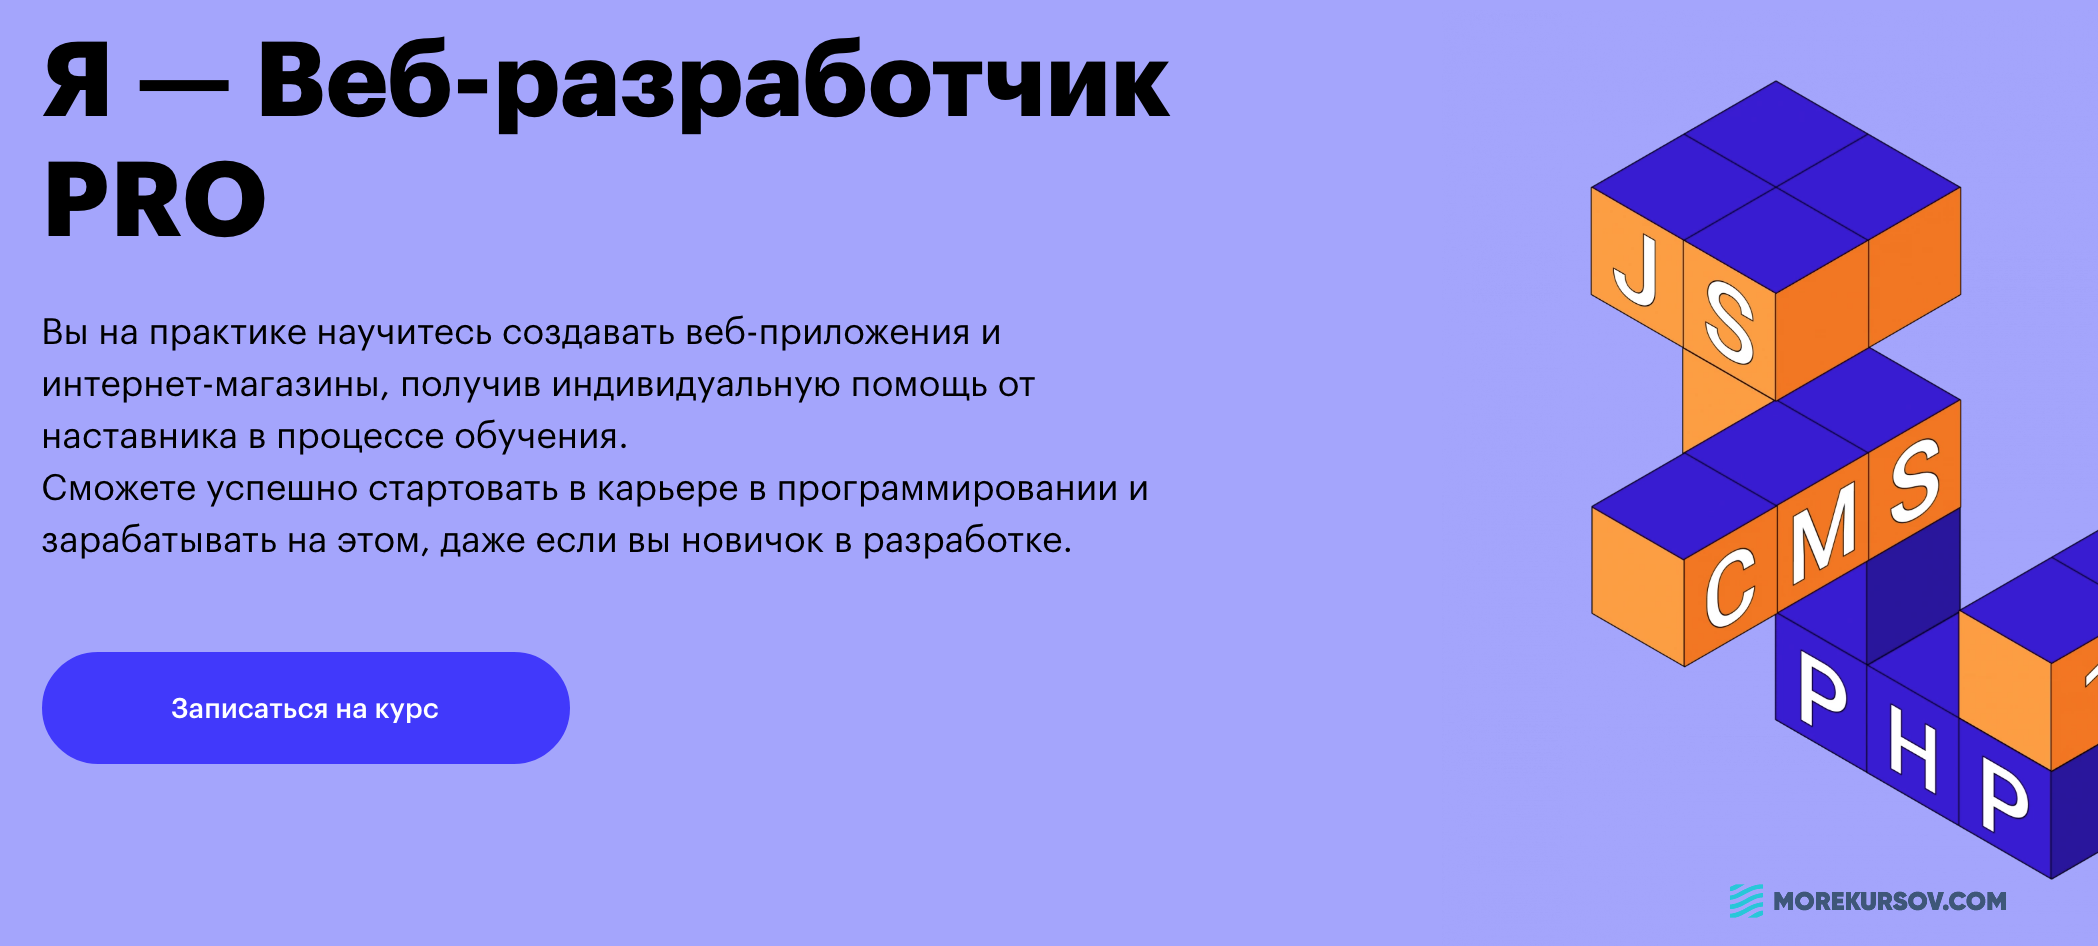 snimok-ehkrana-2020-09-13-v-10-12-19-png.9609